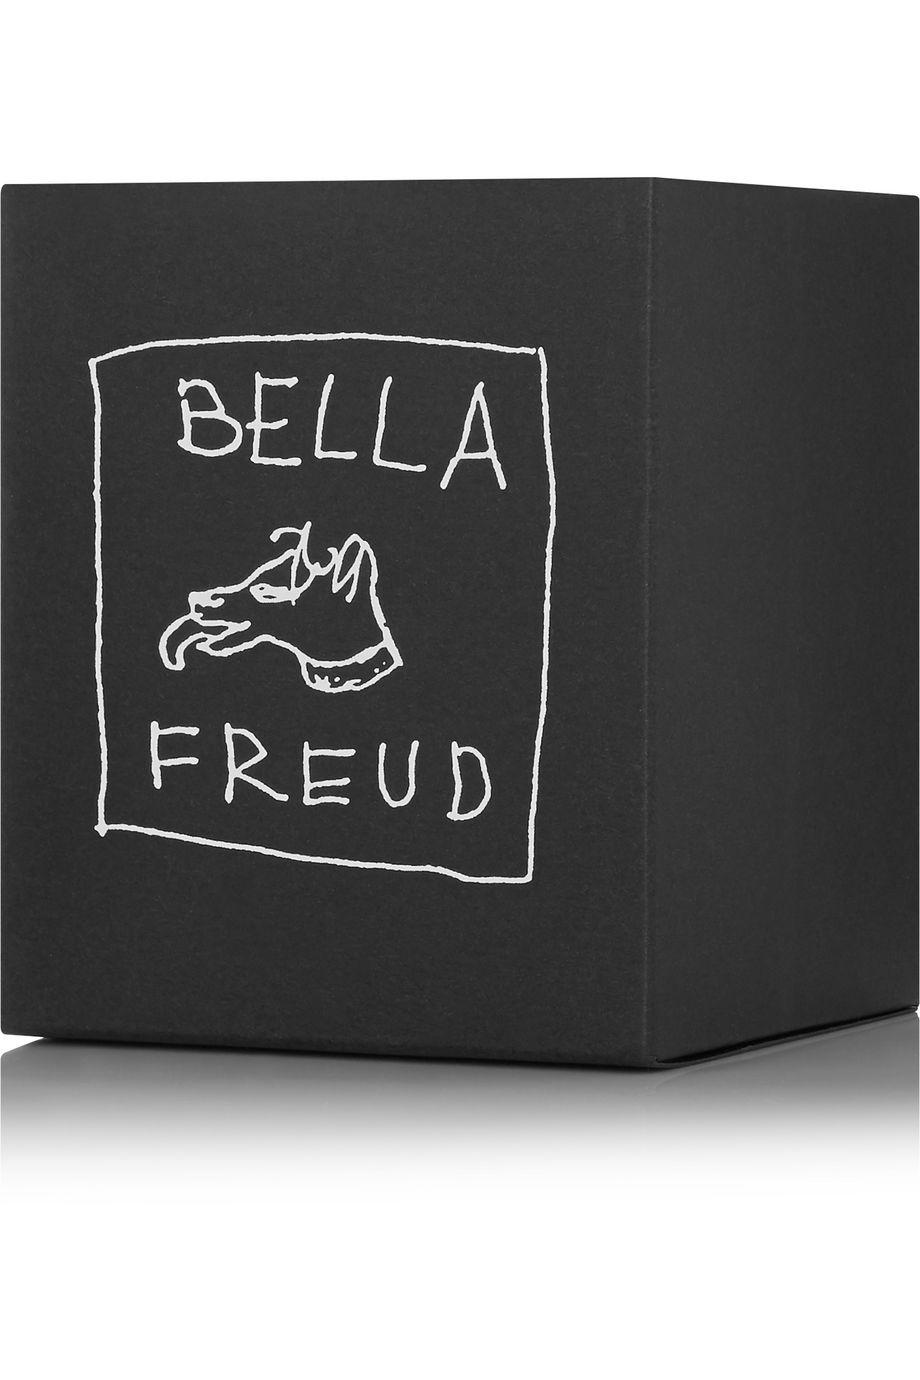 Bella Freud Parfum Signature 香熏蜡烛,180g